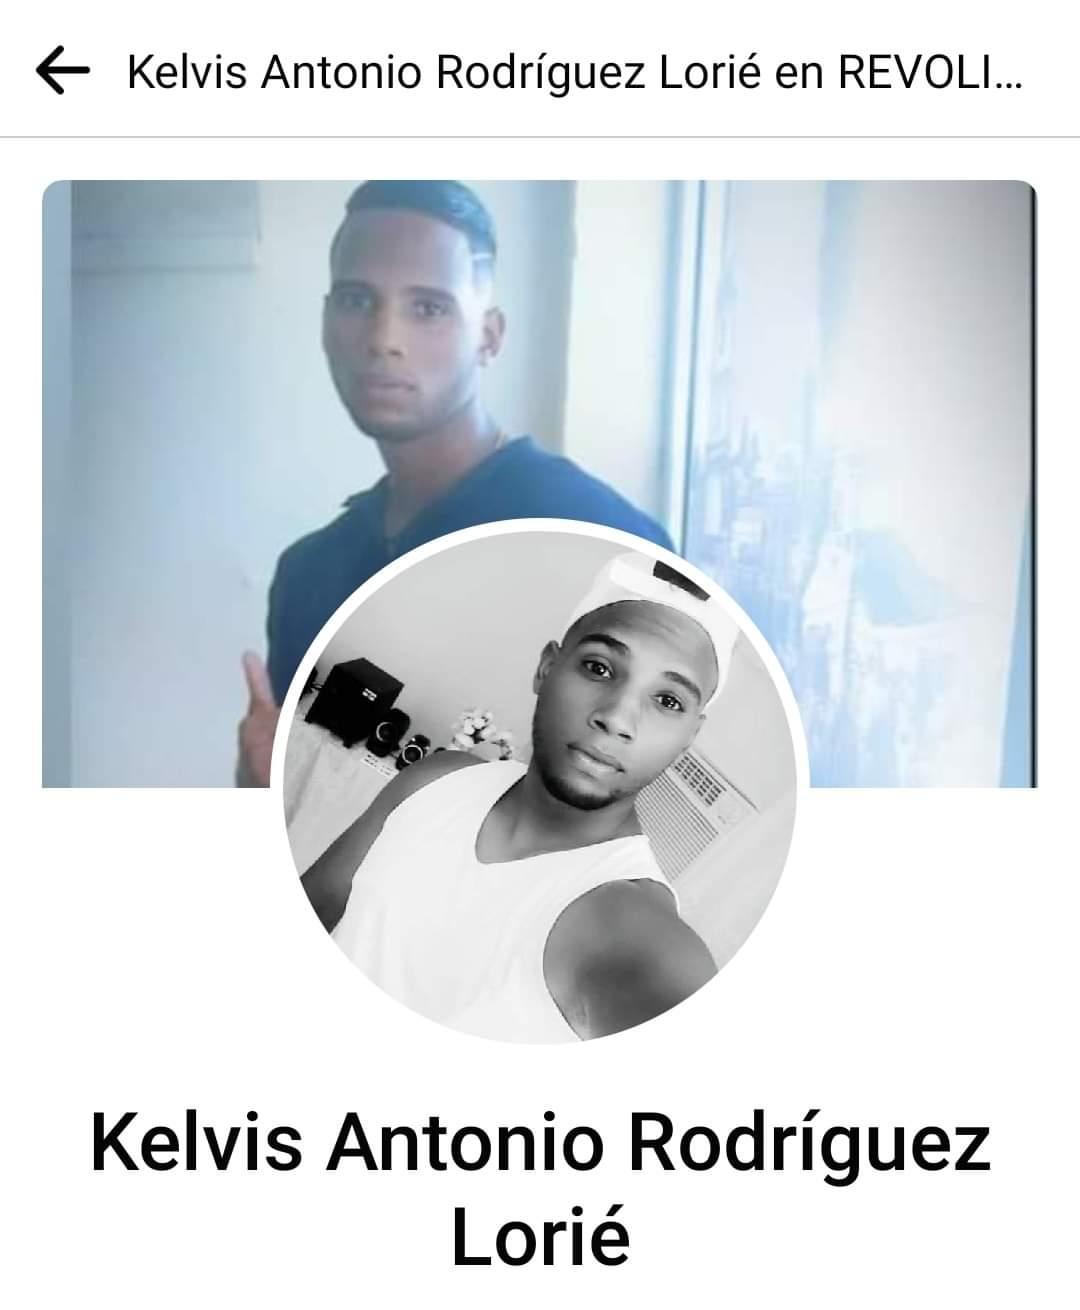 Kelvin Antonio Rodriguez